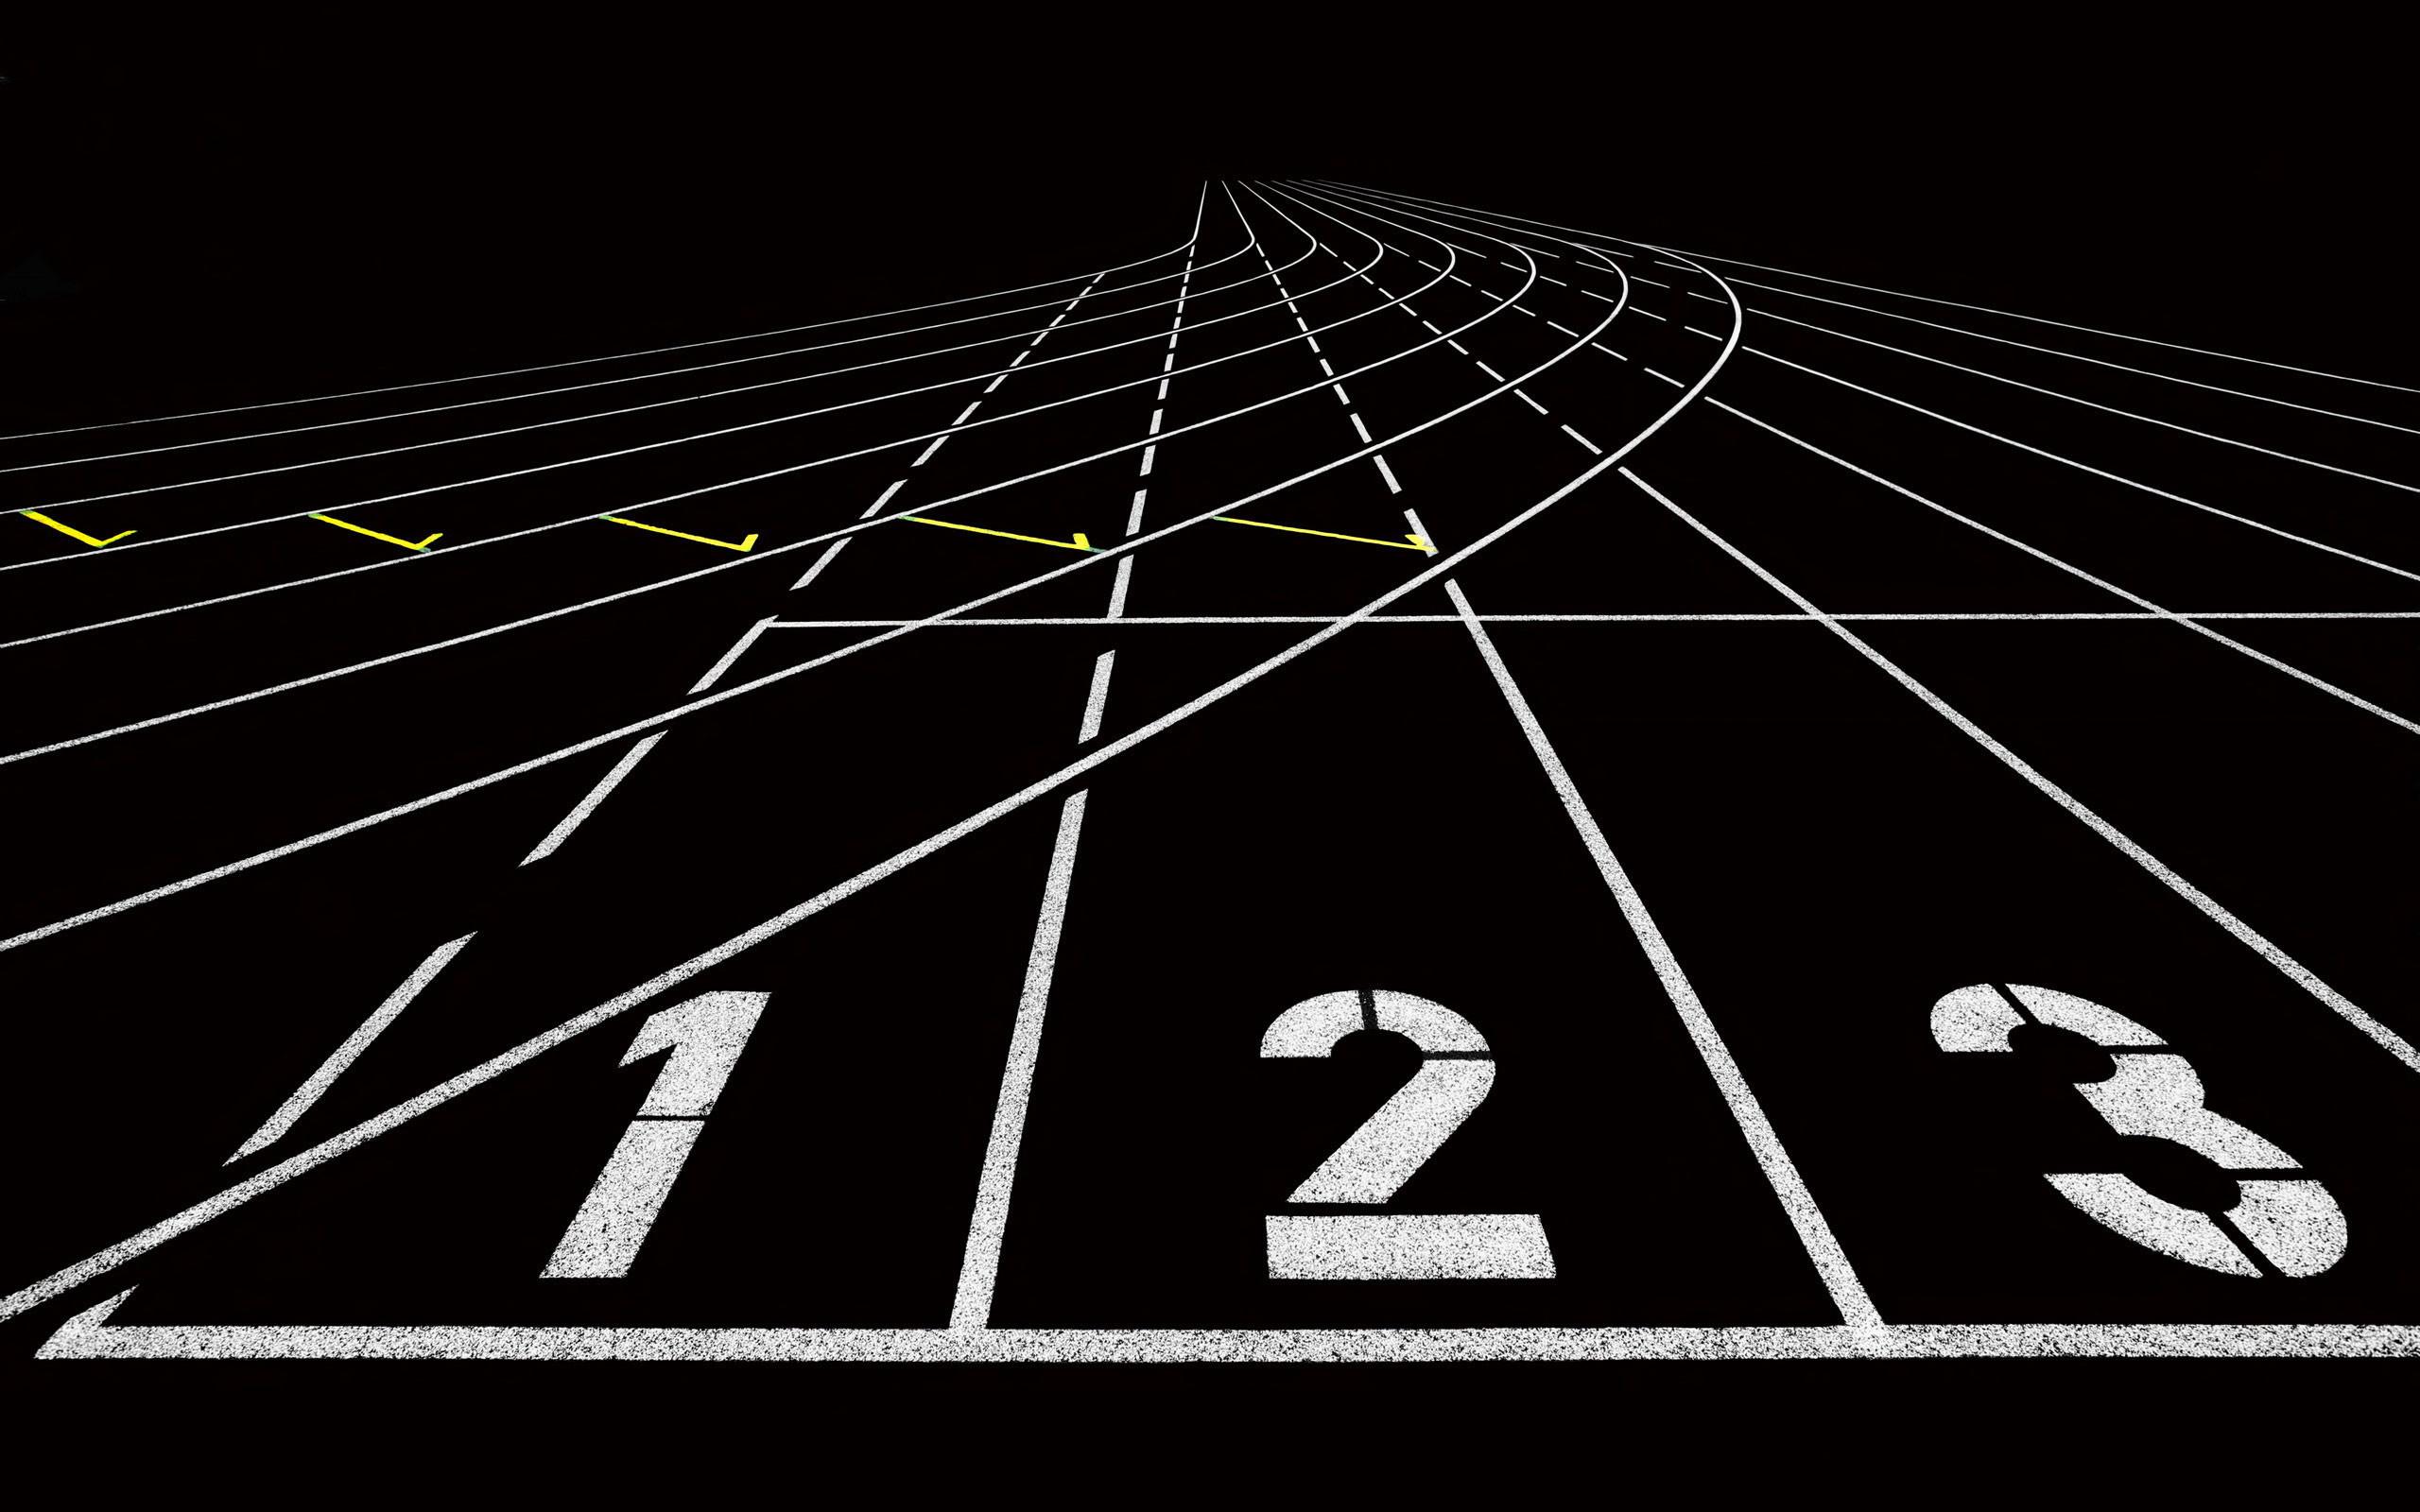 Nike track background